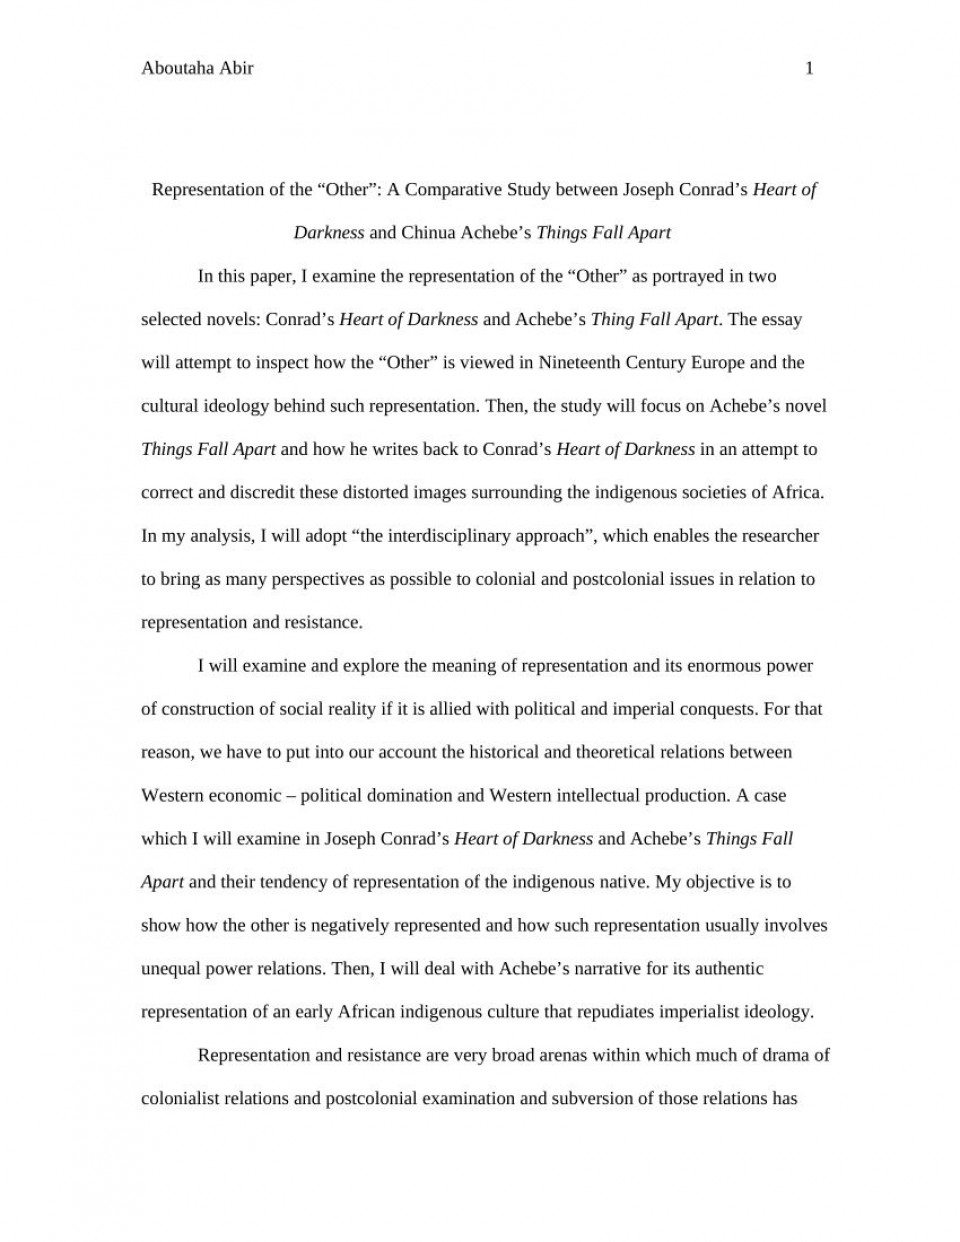 003 Formidable Thing Fall Apart Essay Design 960